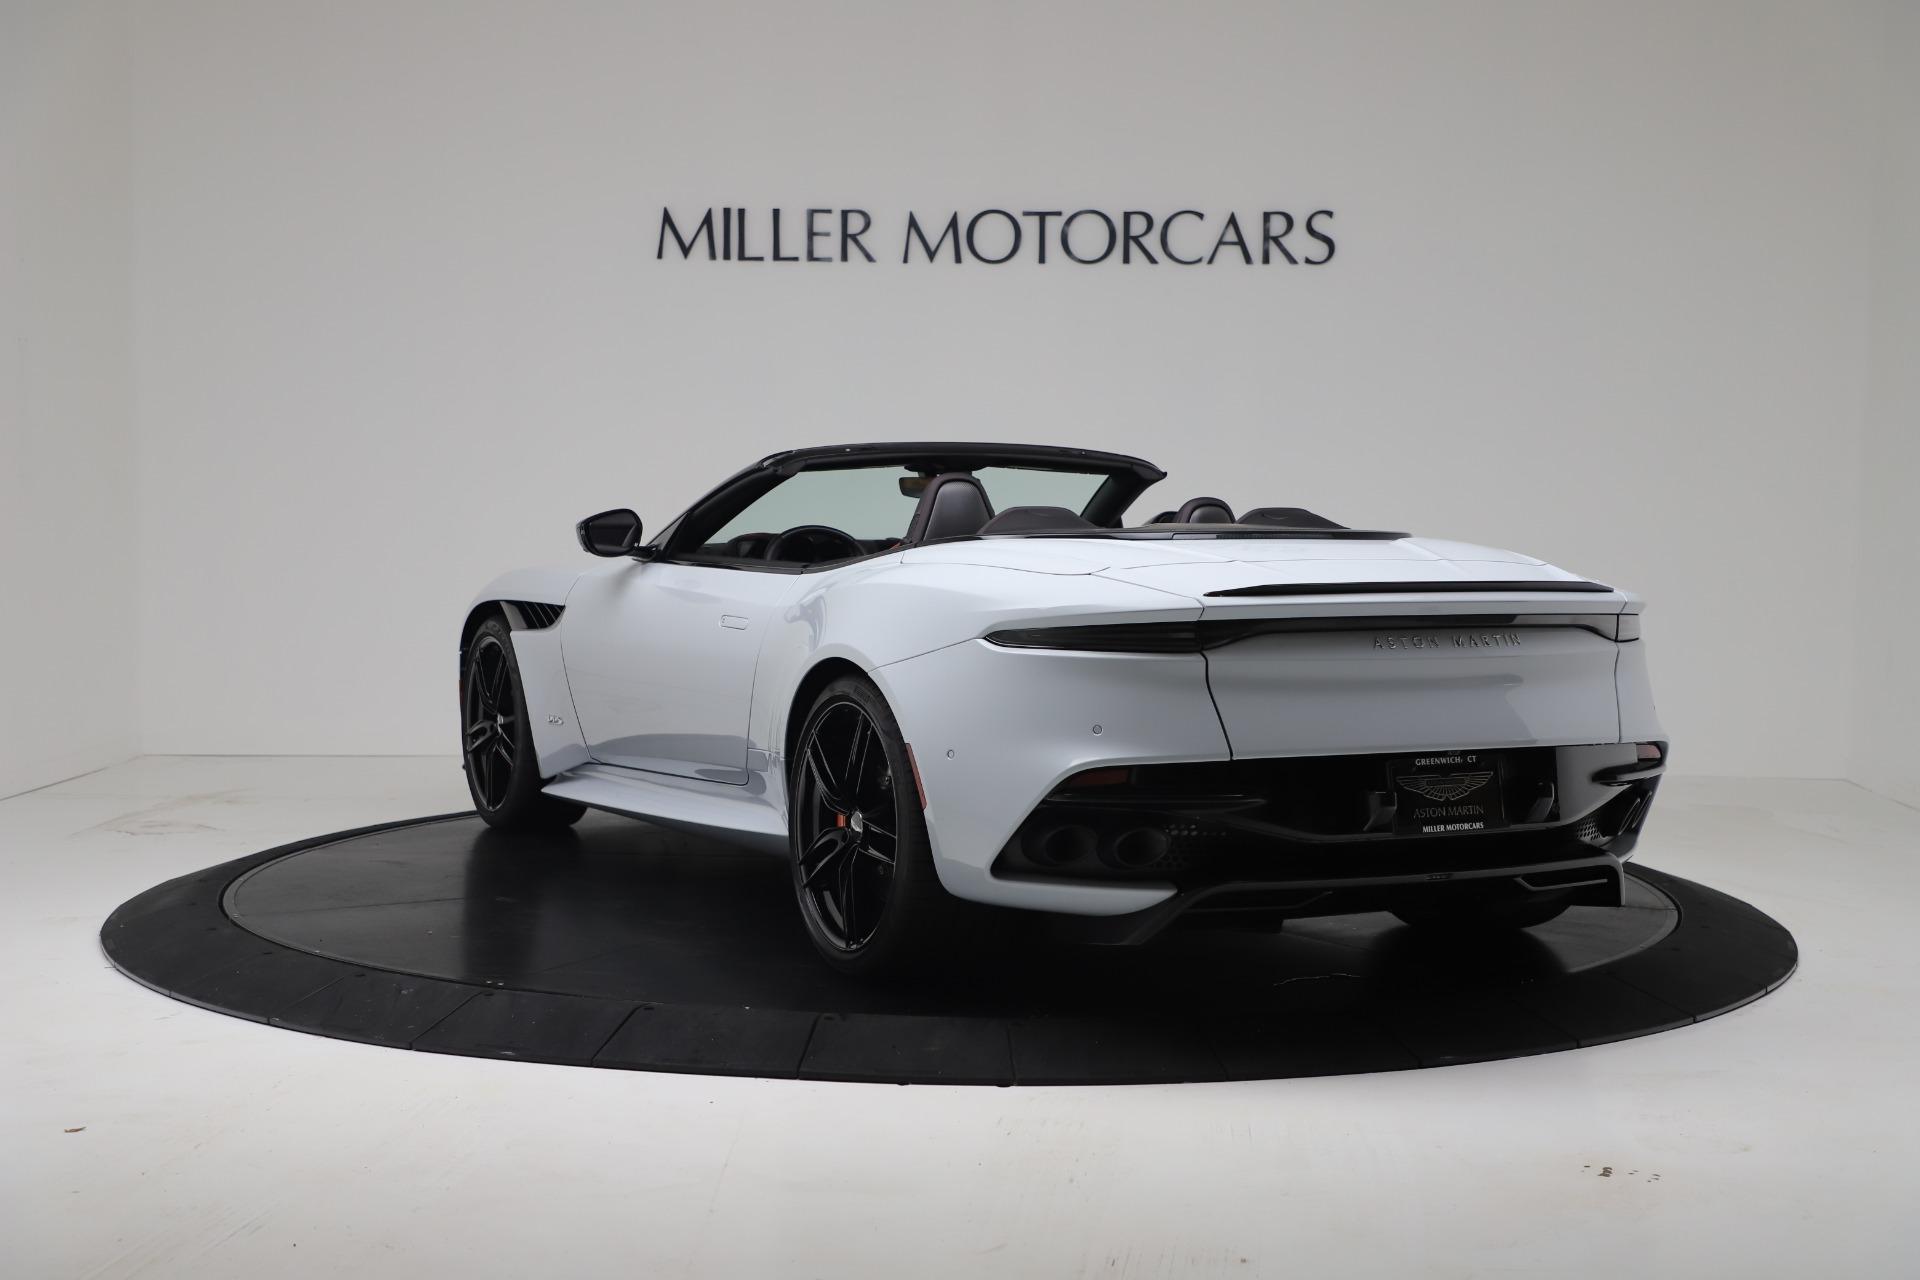 New 2020 Aston Martin DBS Superleggera For Sale In Greenwich, CT 3484_p4